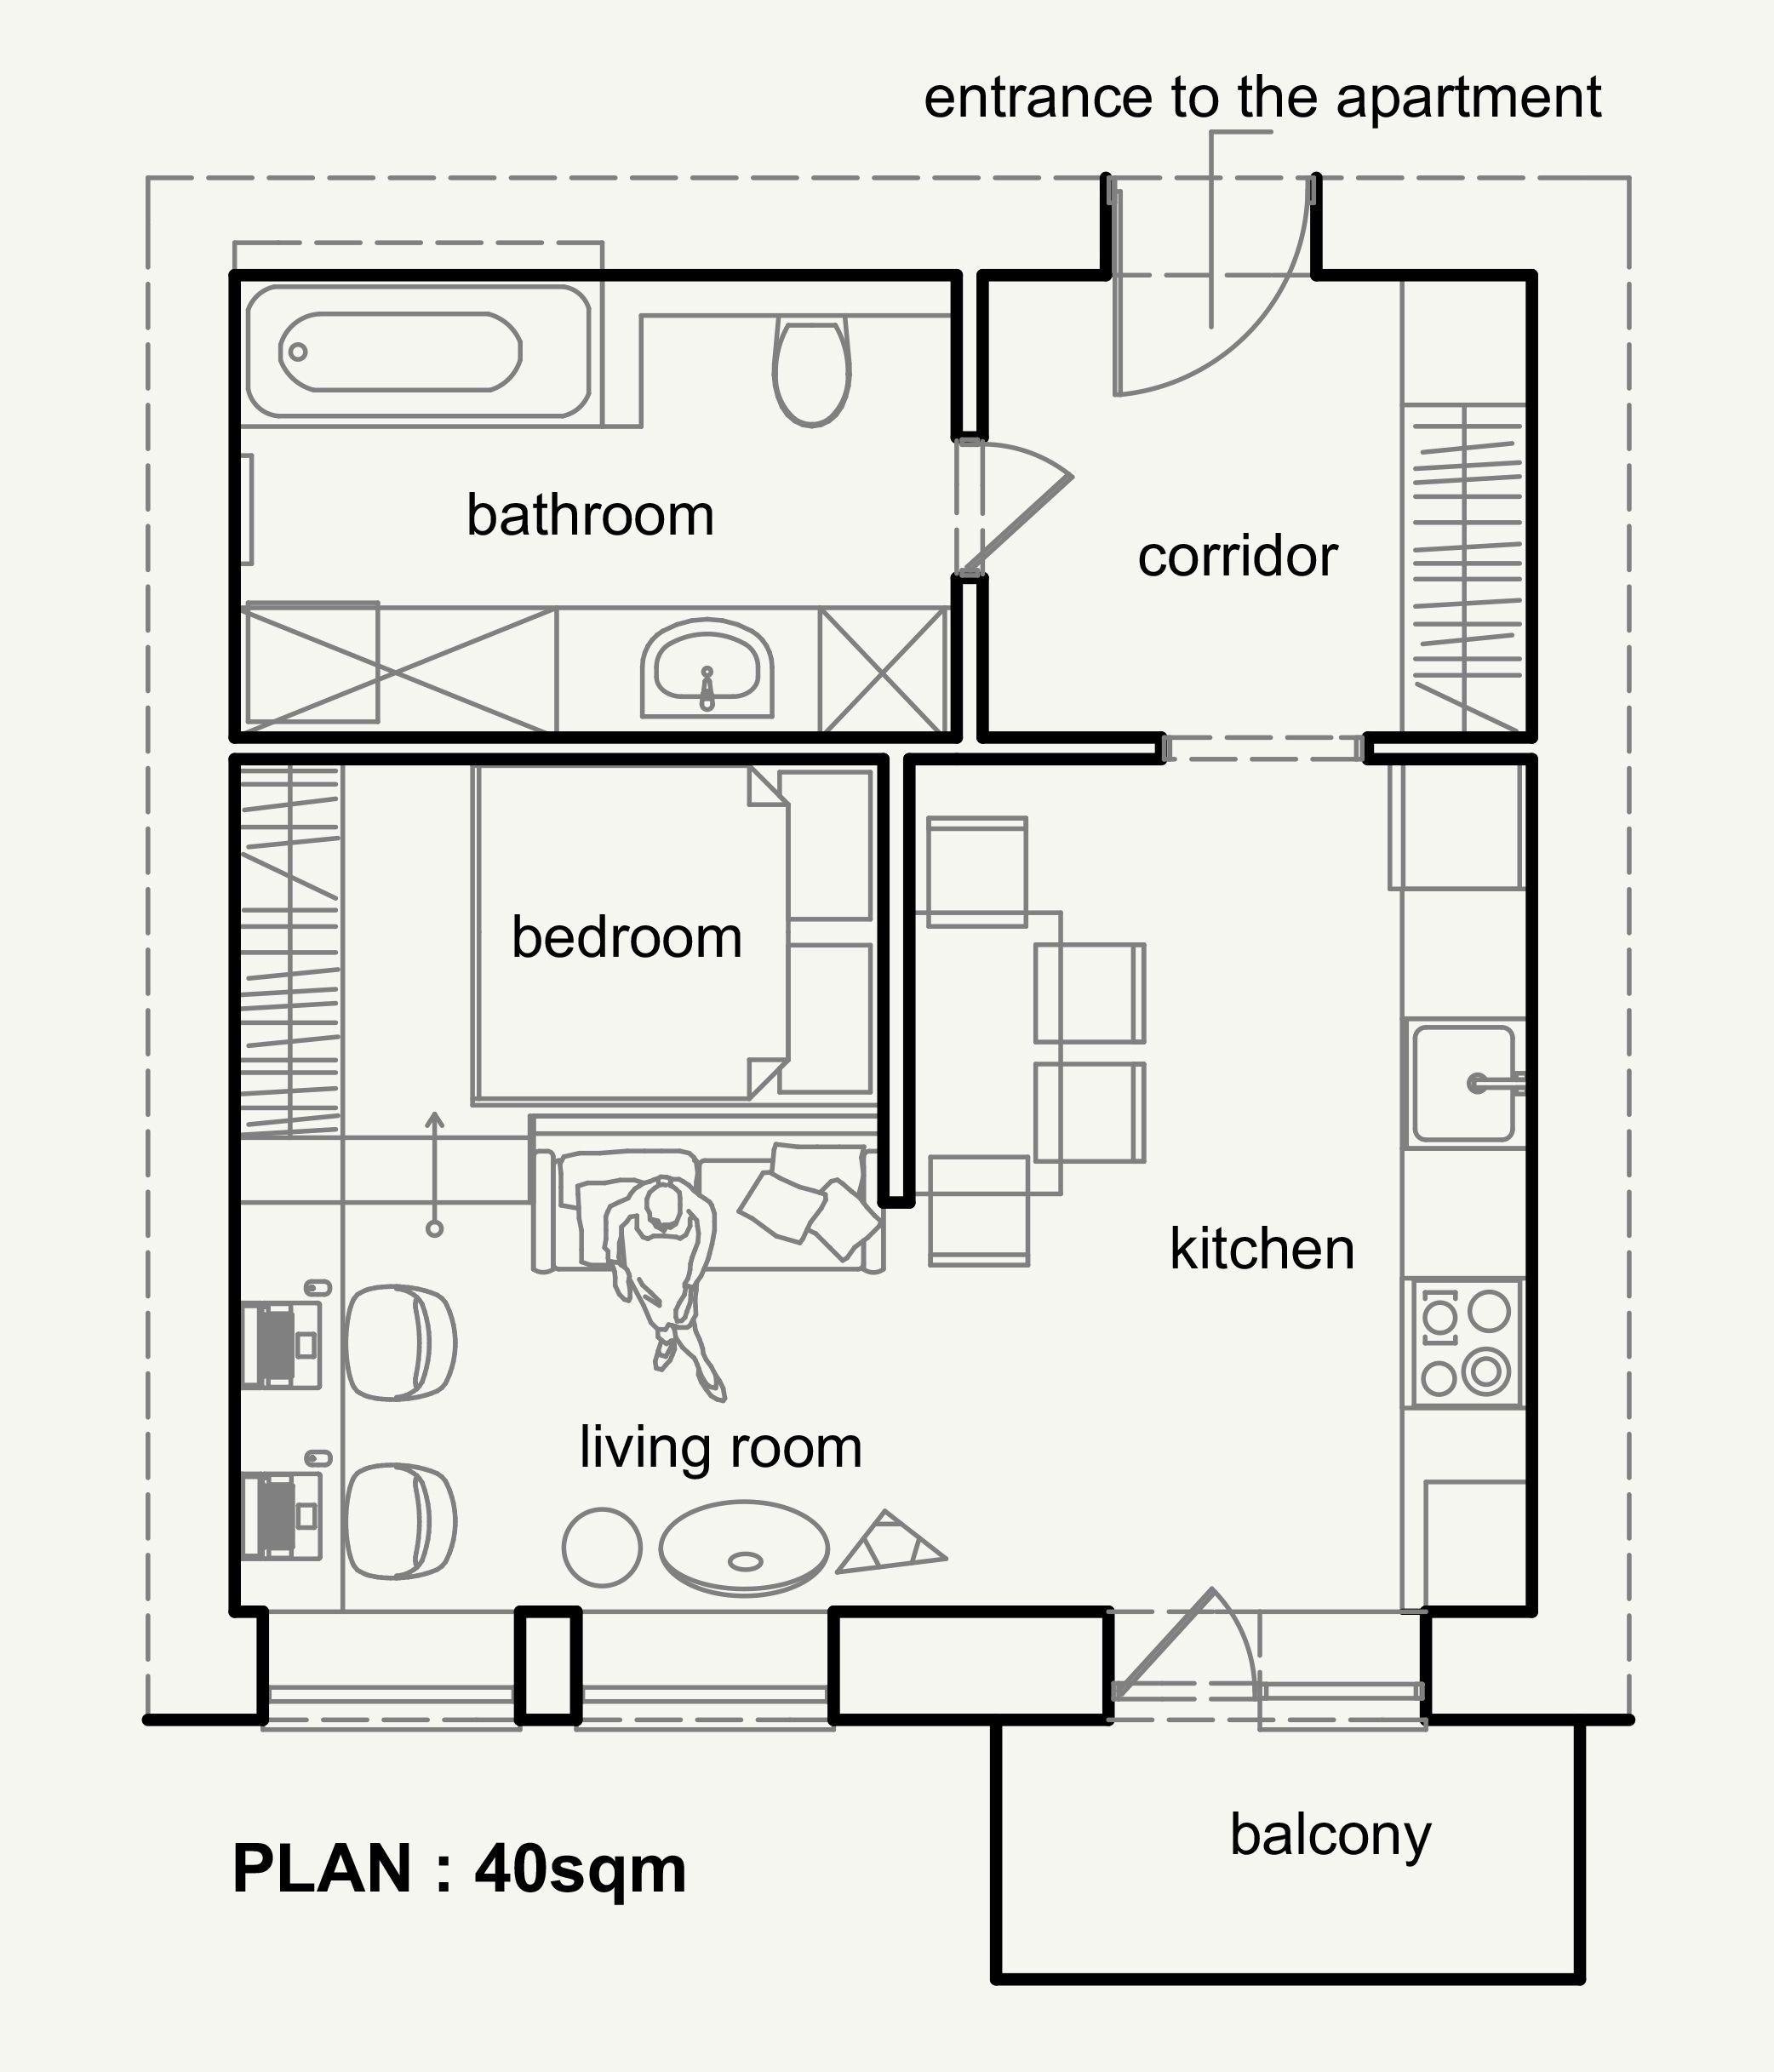 This 40 sq. meters/430 sq. feet chic apartment in Lviv